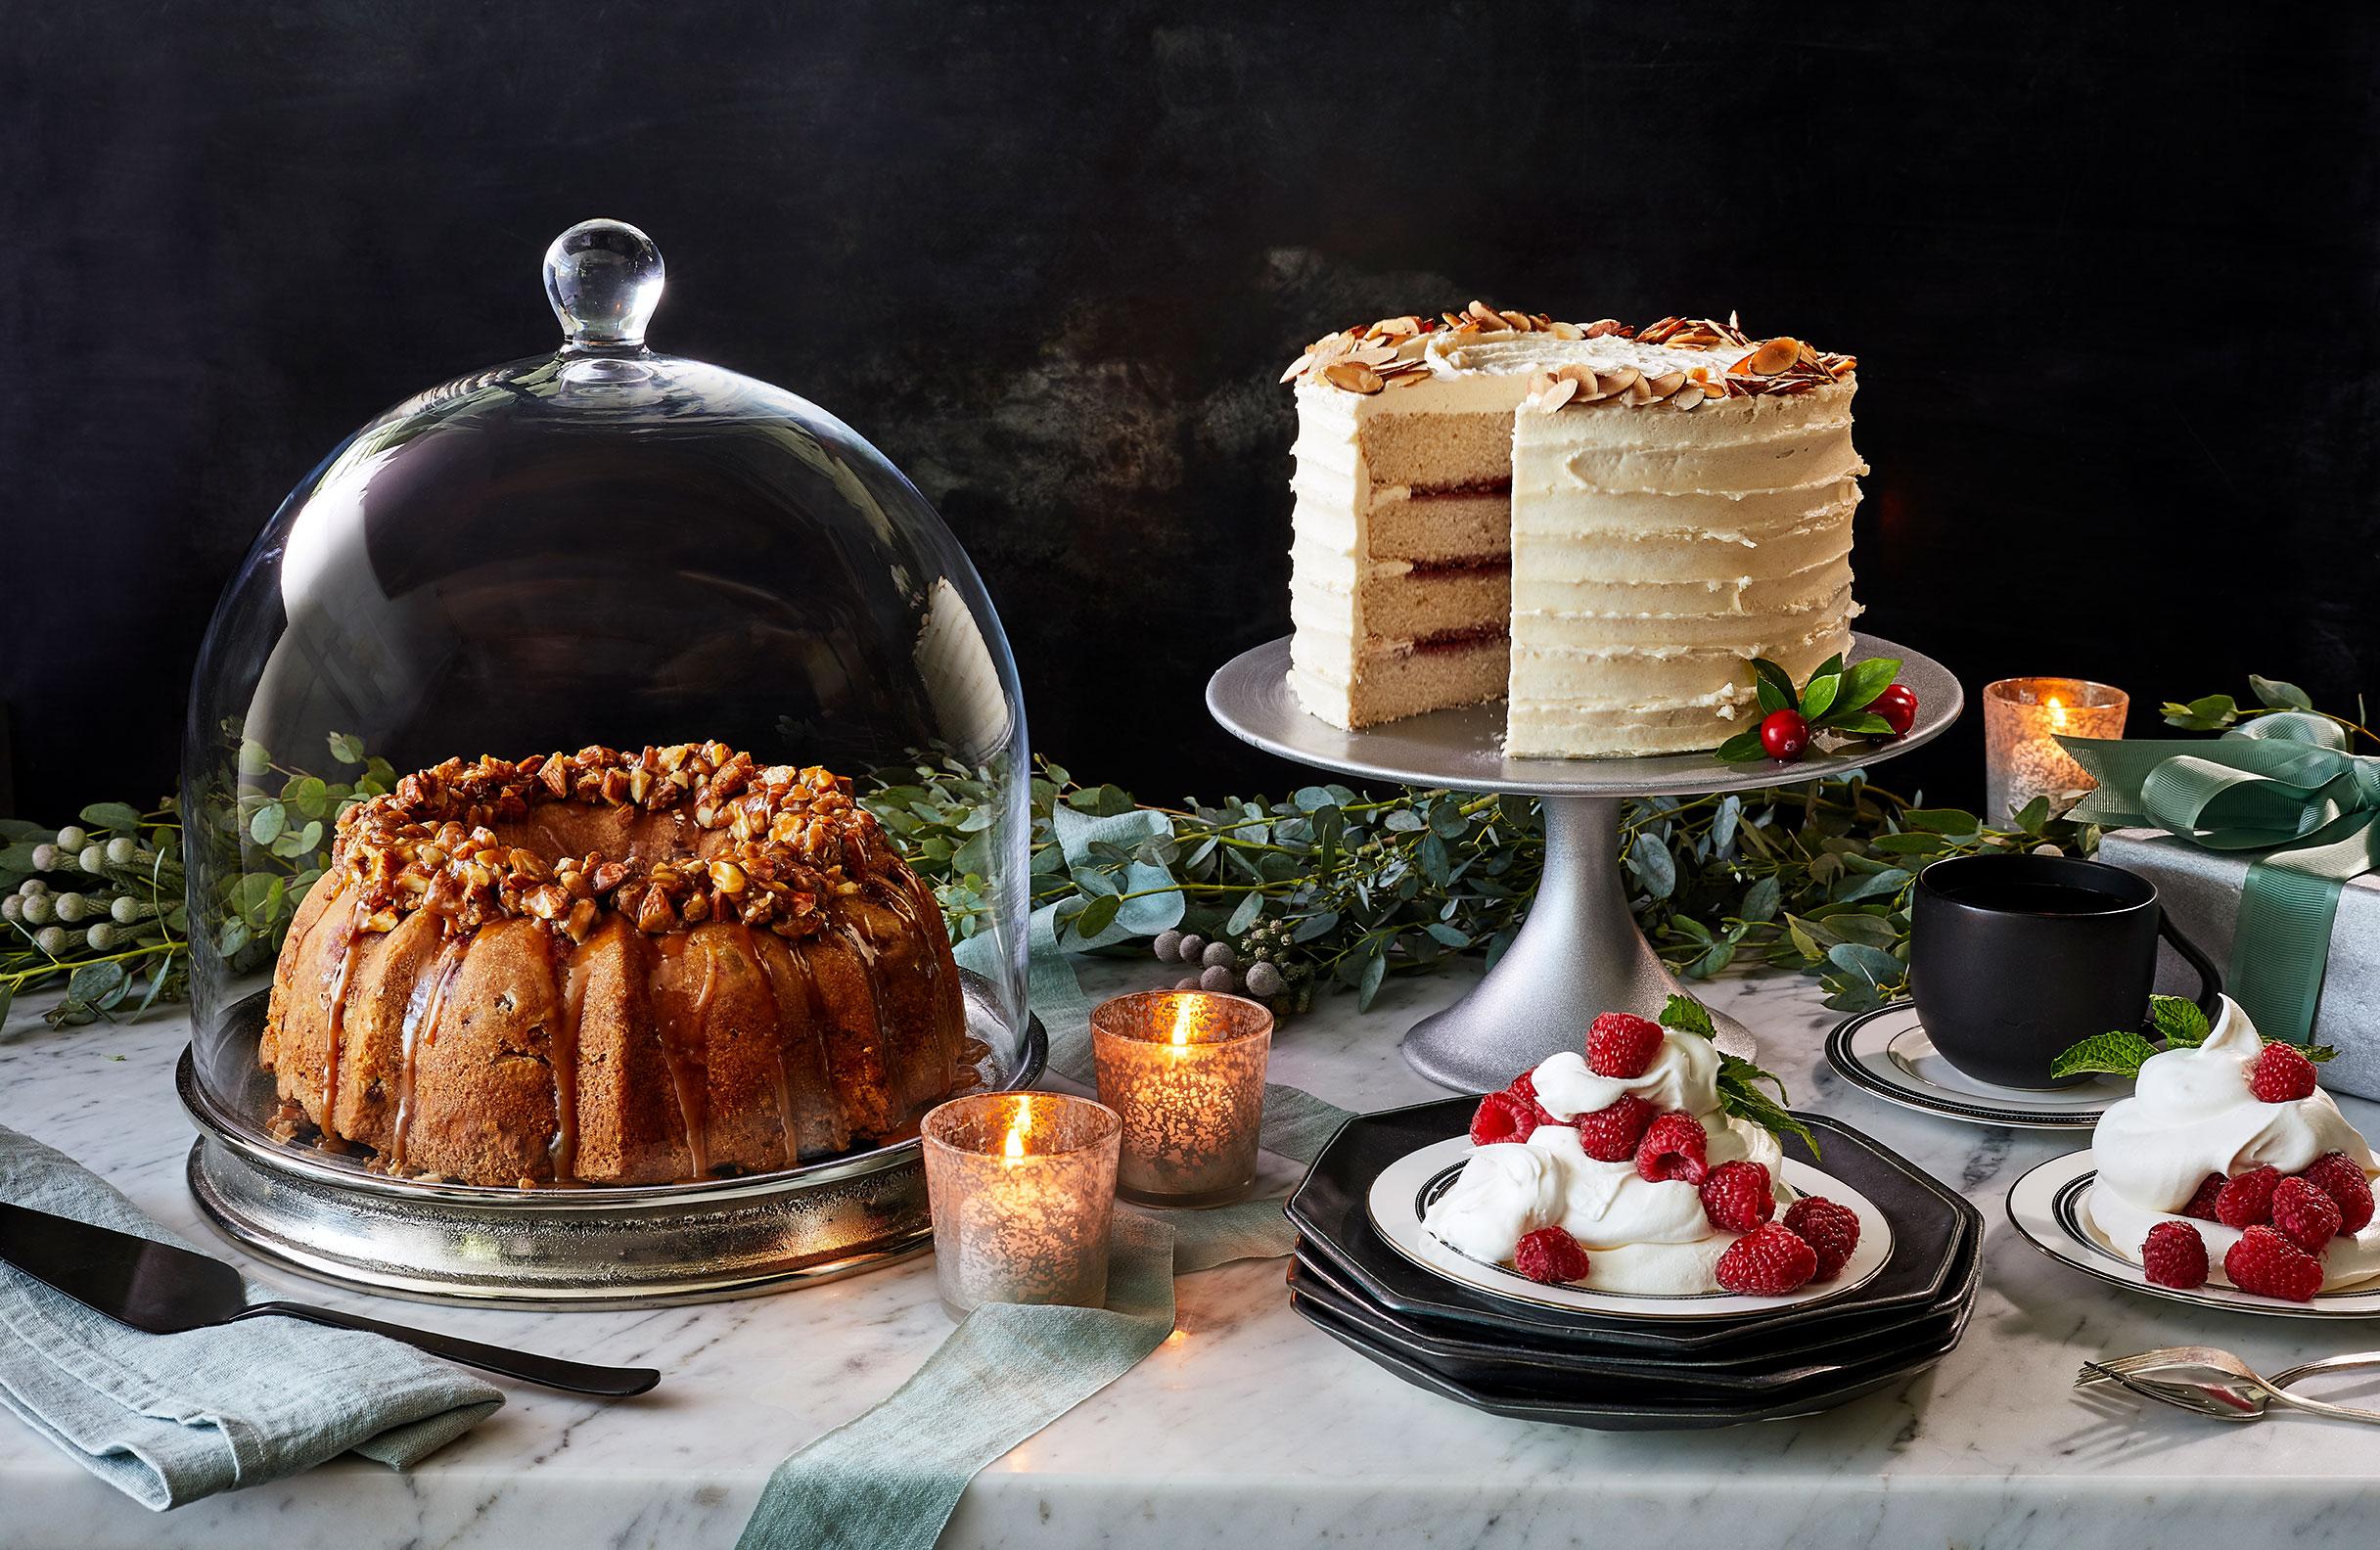 Linzertorte_Layer_Cake_Pavolvas_Streusel_Cake_337_C.jpg